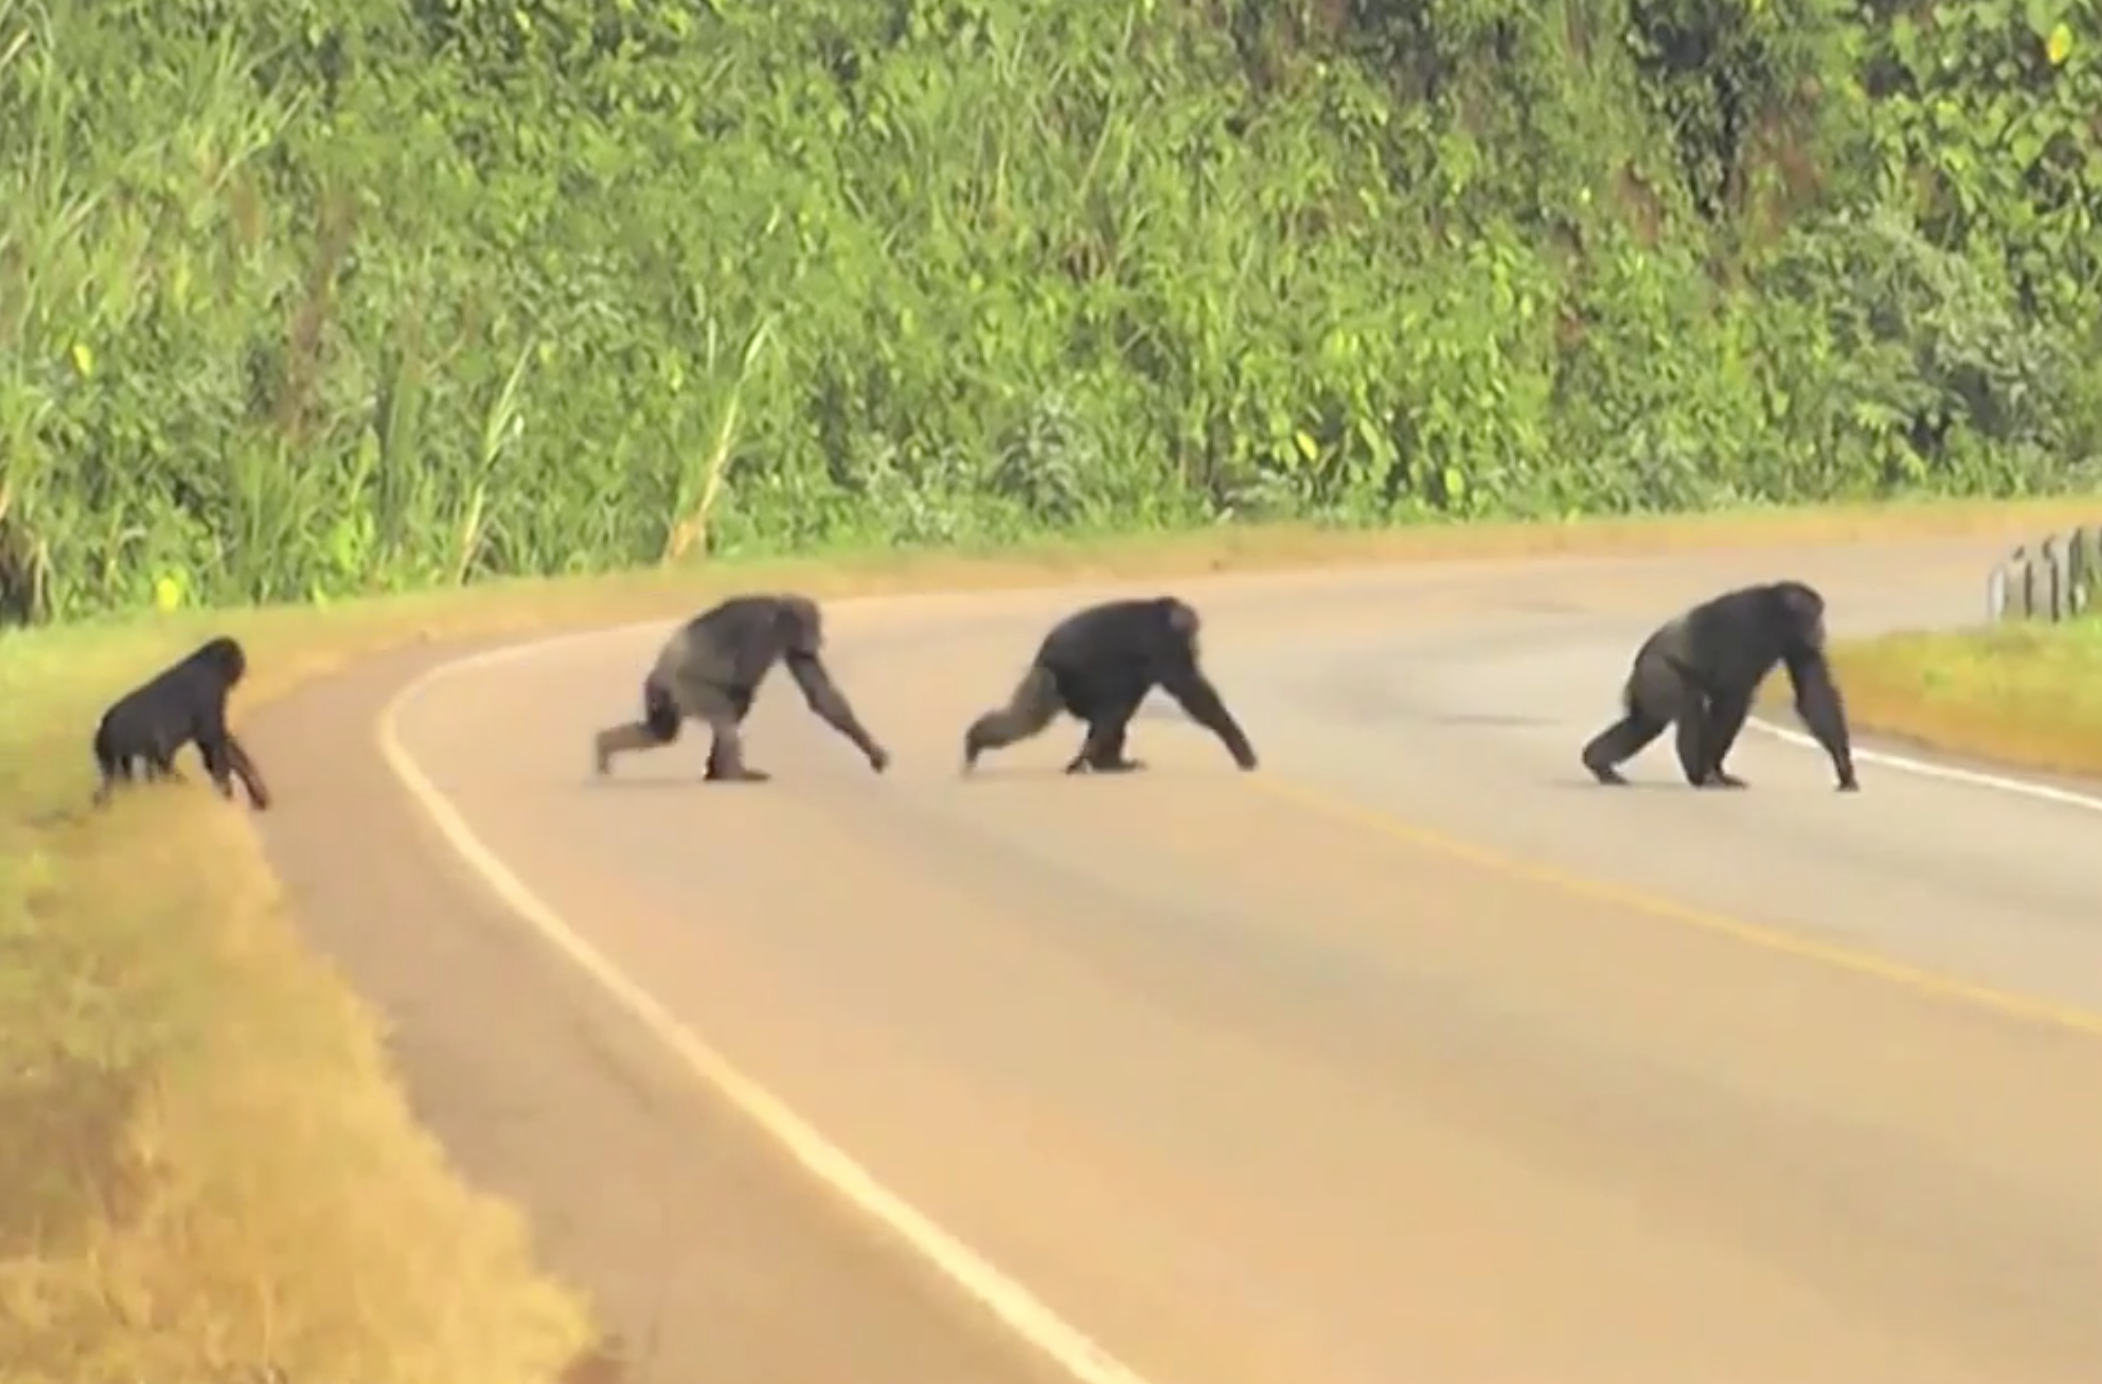 wild chimps crossing road